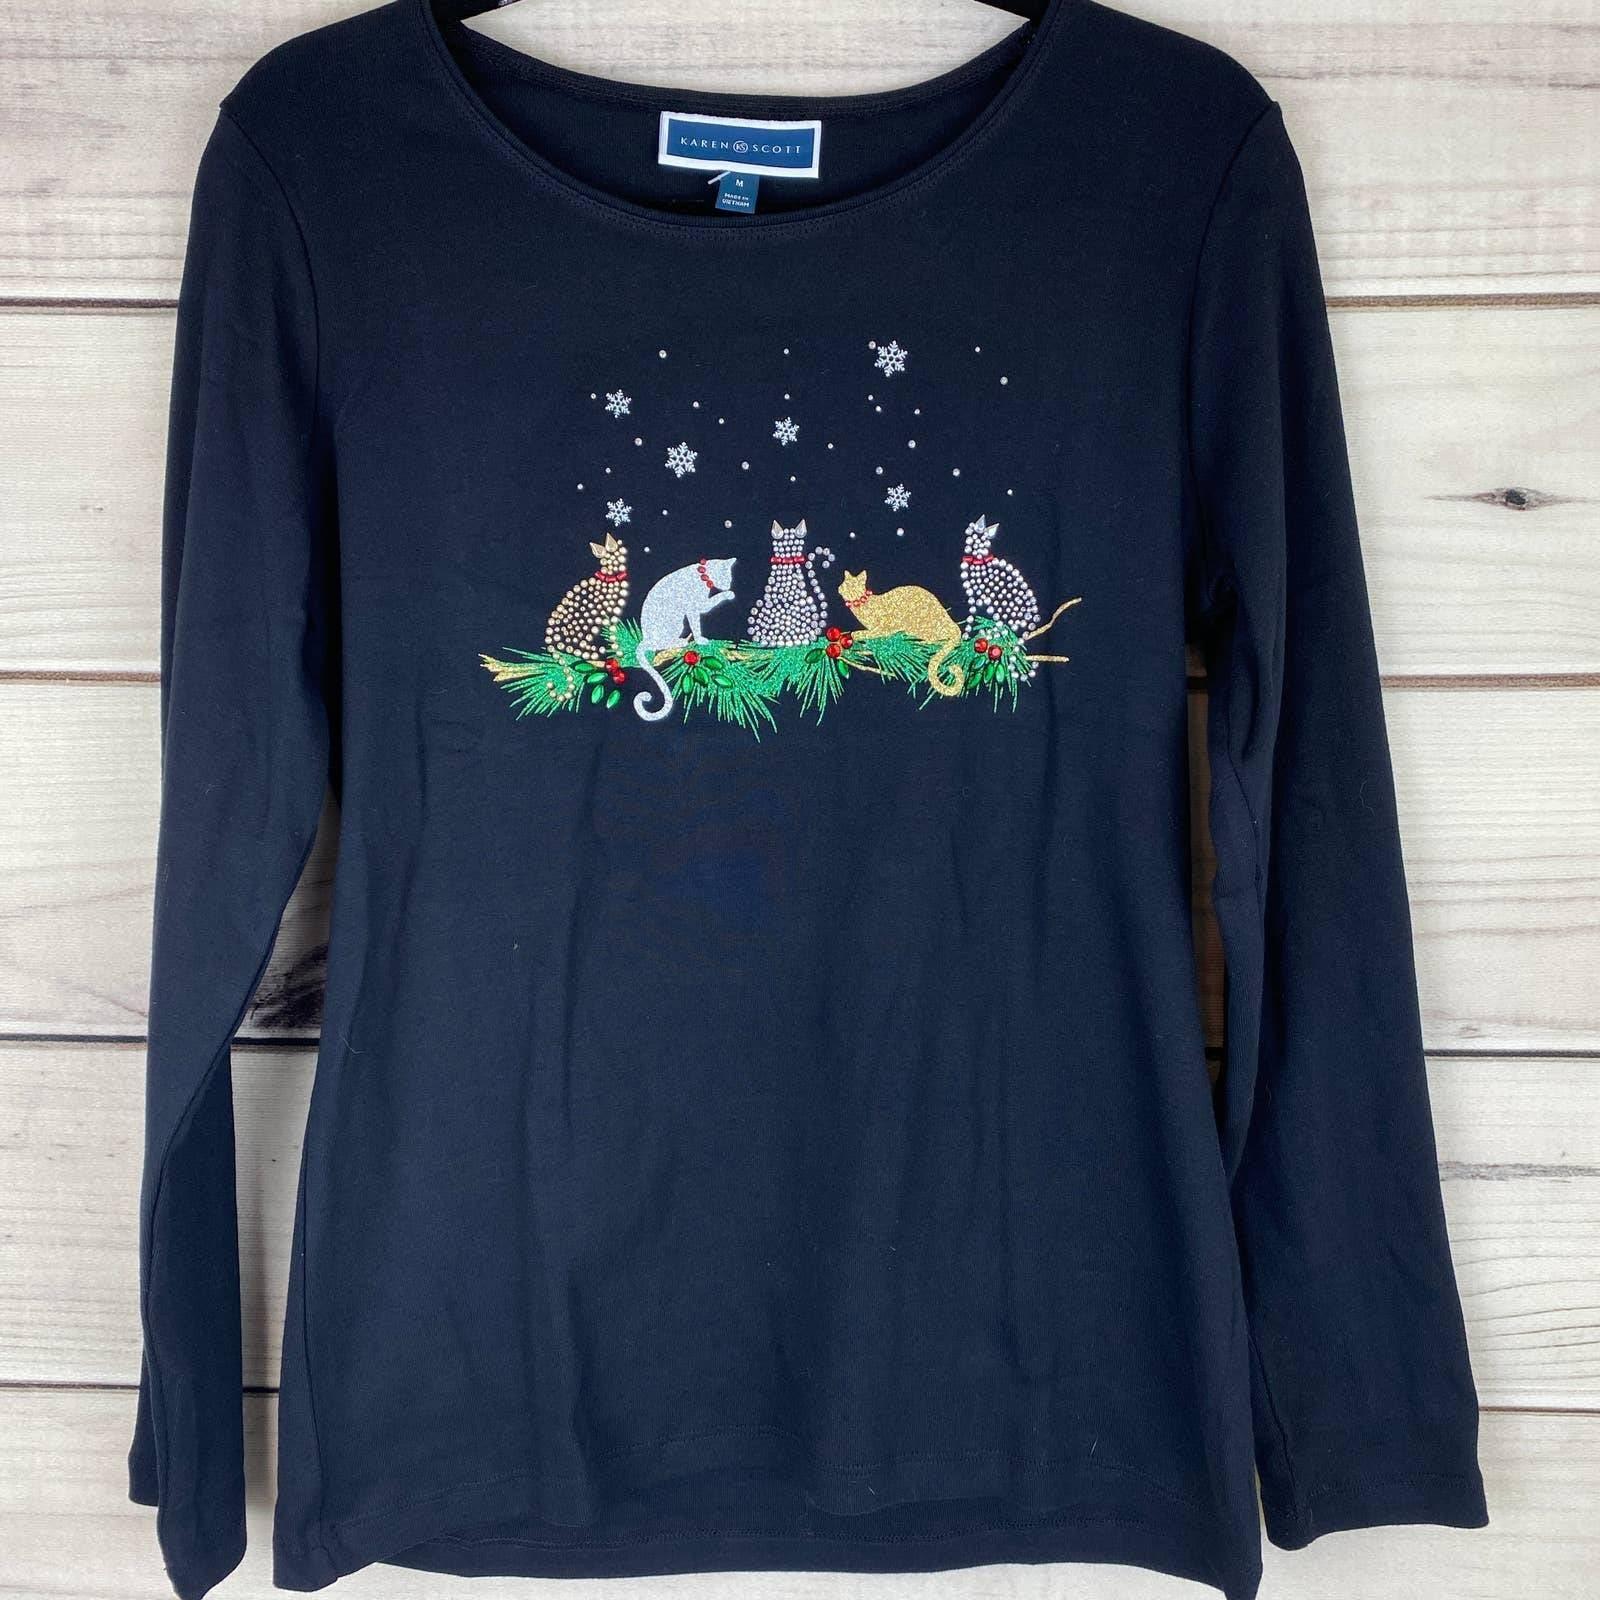 KAREN SCOTT Christmas Cats L/S Tee-Blk-M